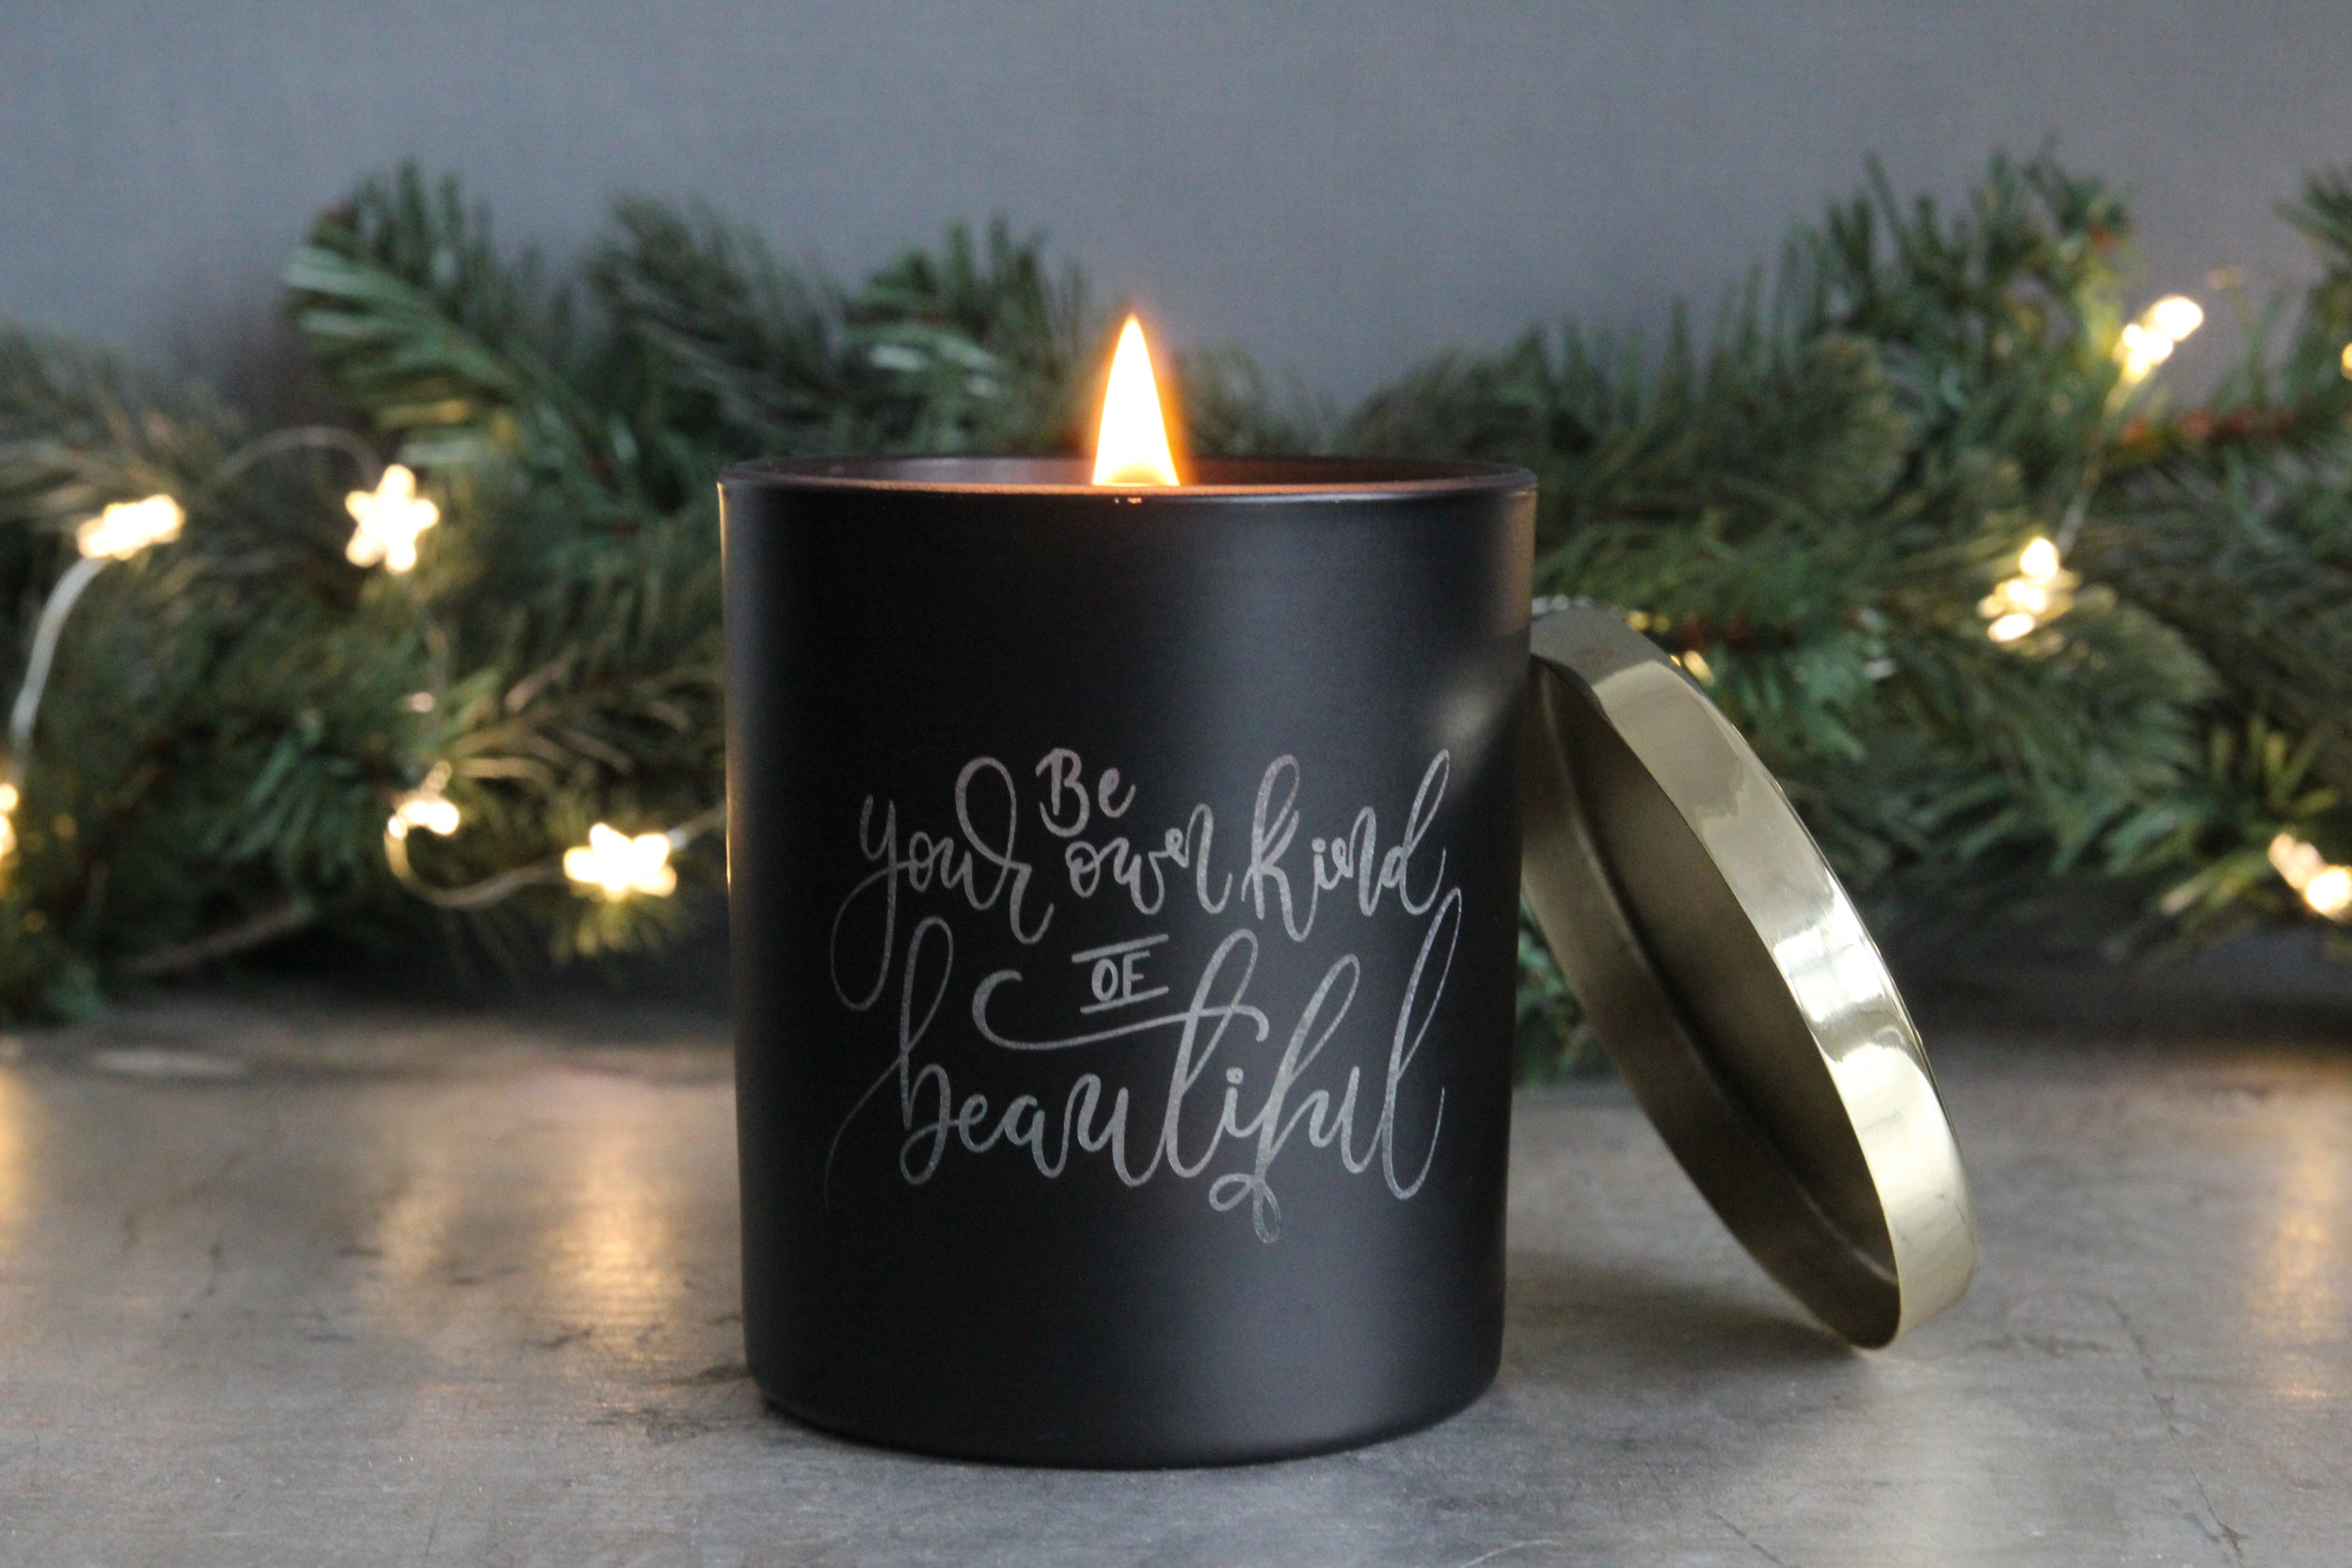 Black+candle+lit3.jpg